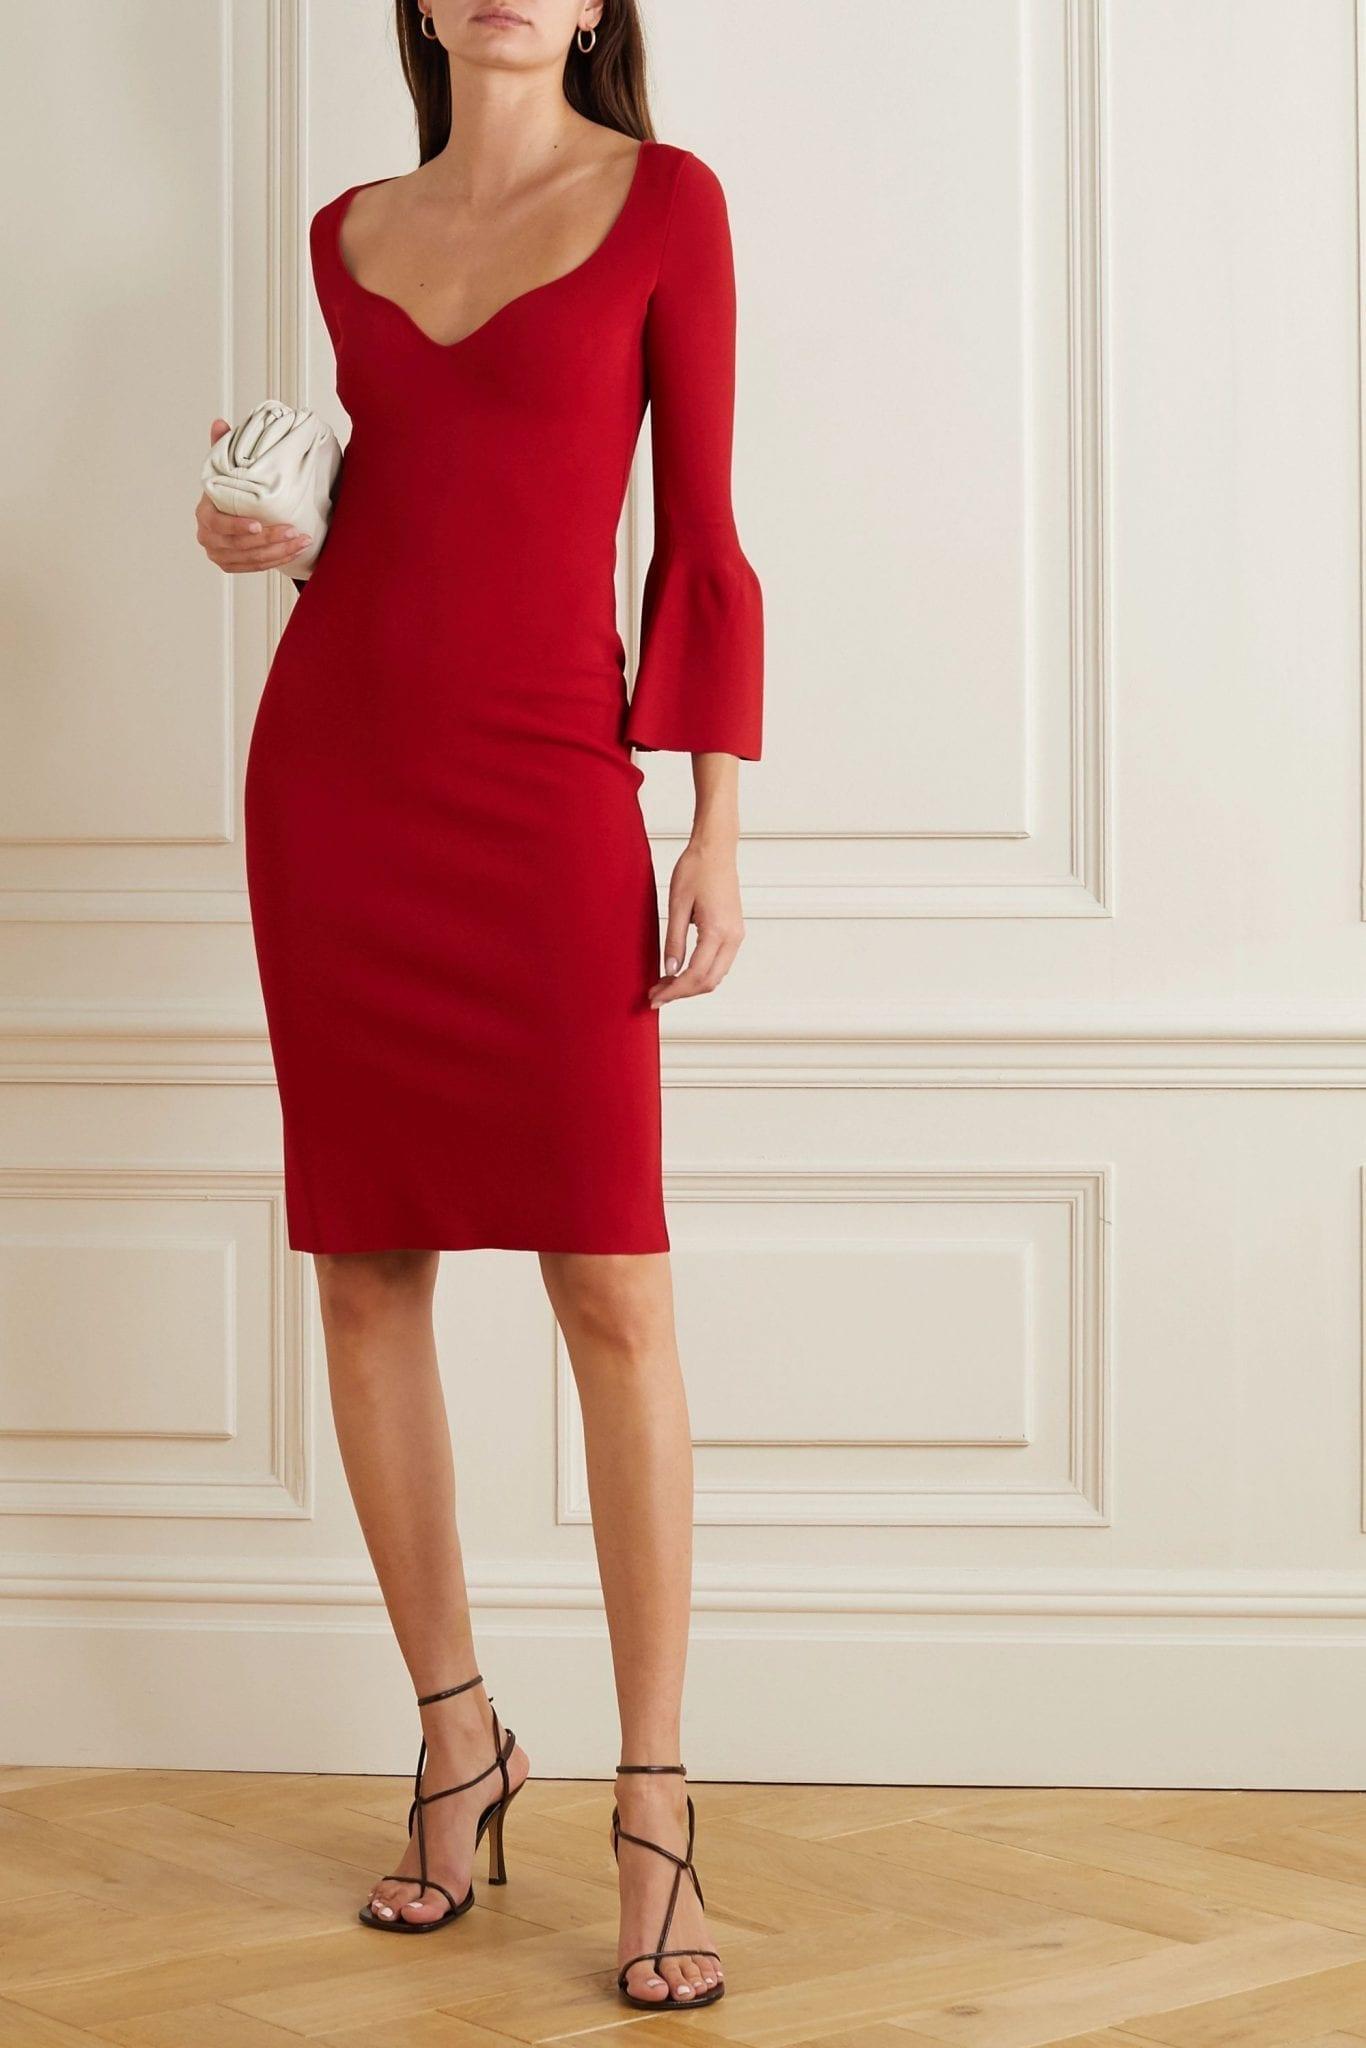 STELLA MCCARTNEY Stretch-knit Dress